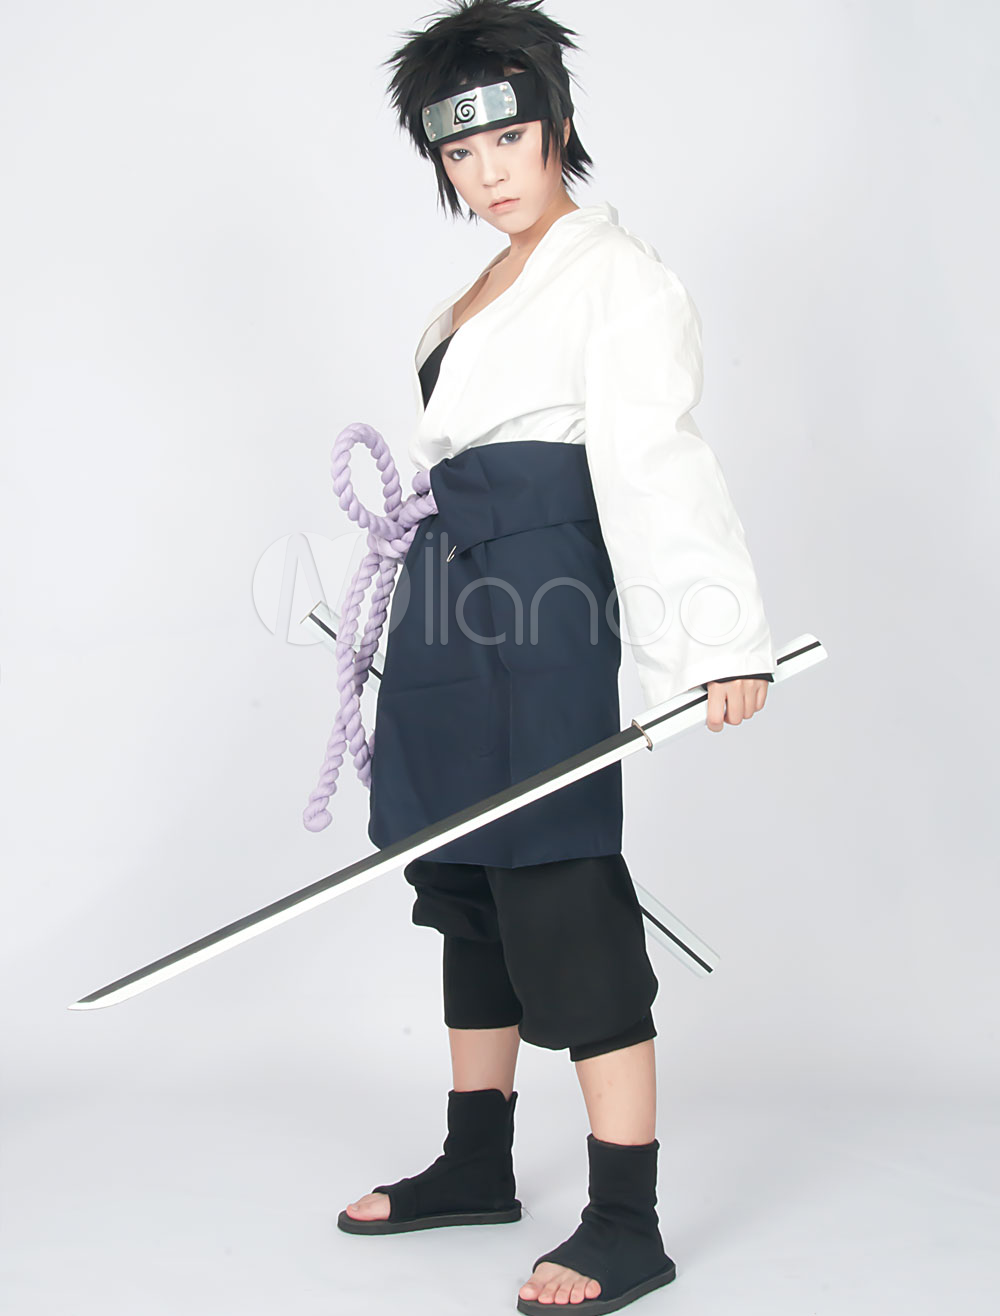 Les cosplay ! - Page 2 Naruto-Uchiha-Sasuke-Cosplay-Costume-6753-0